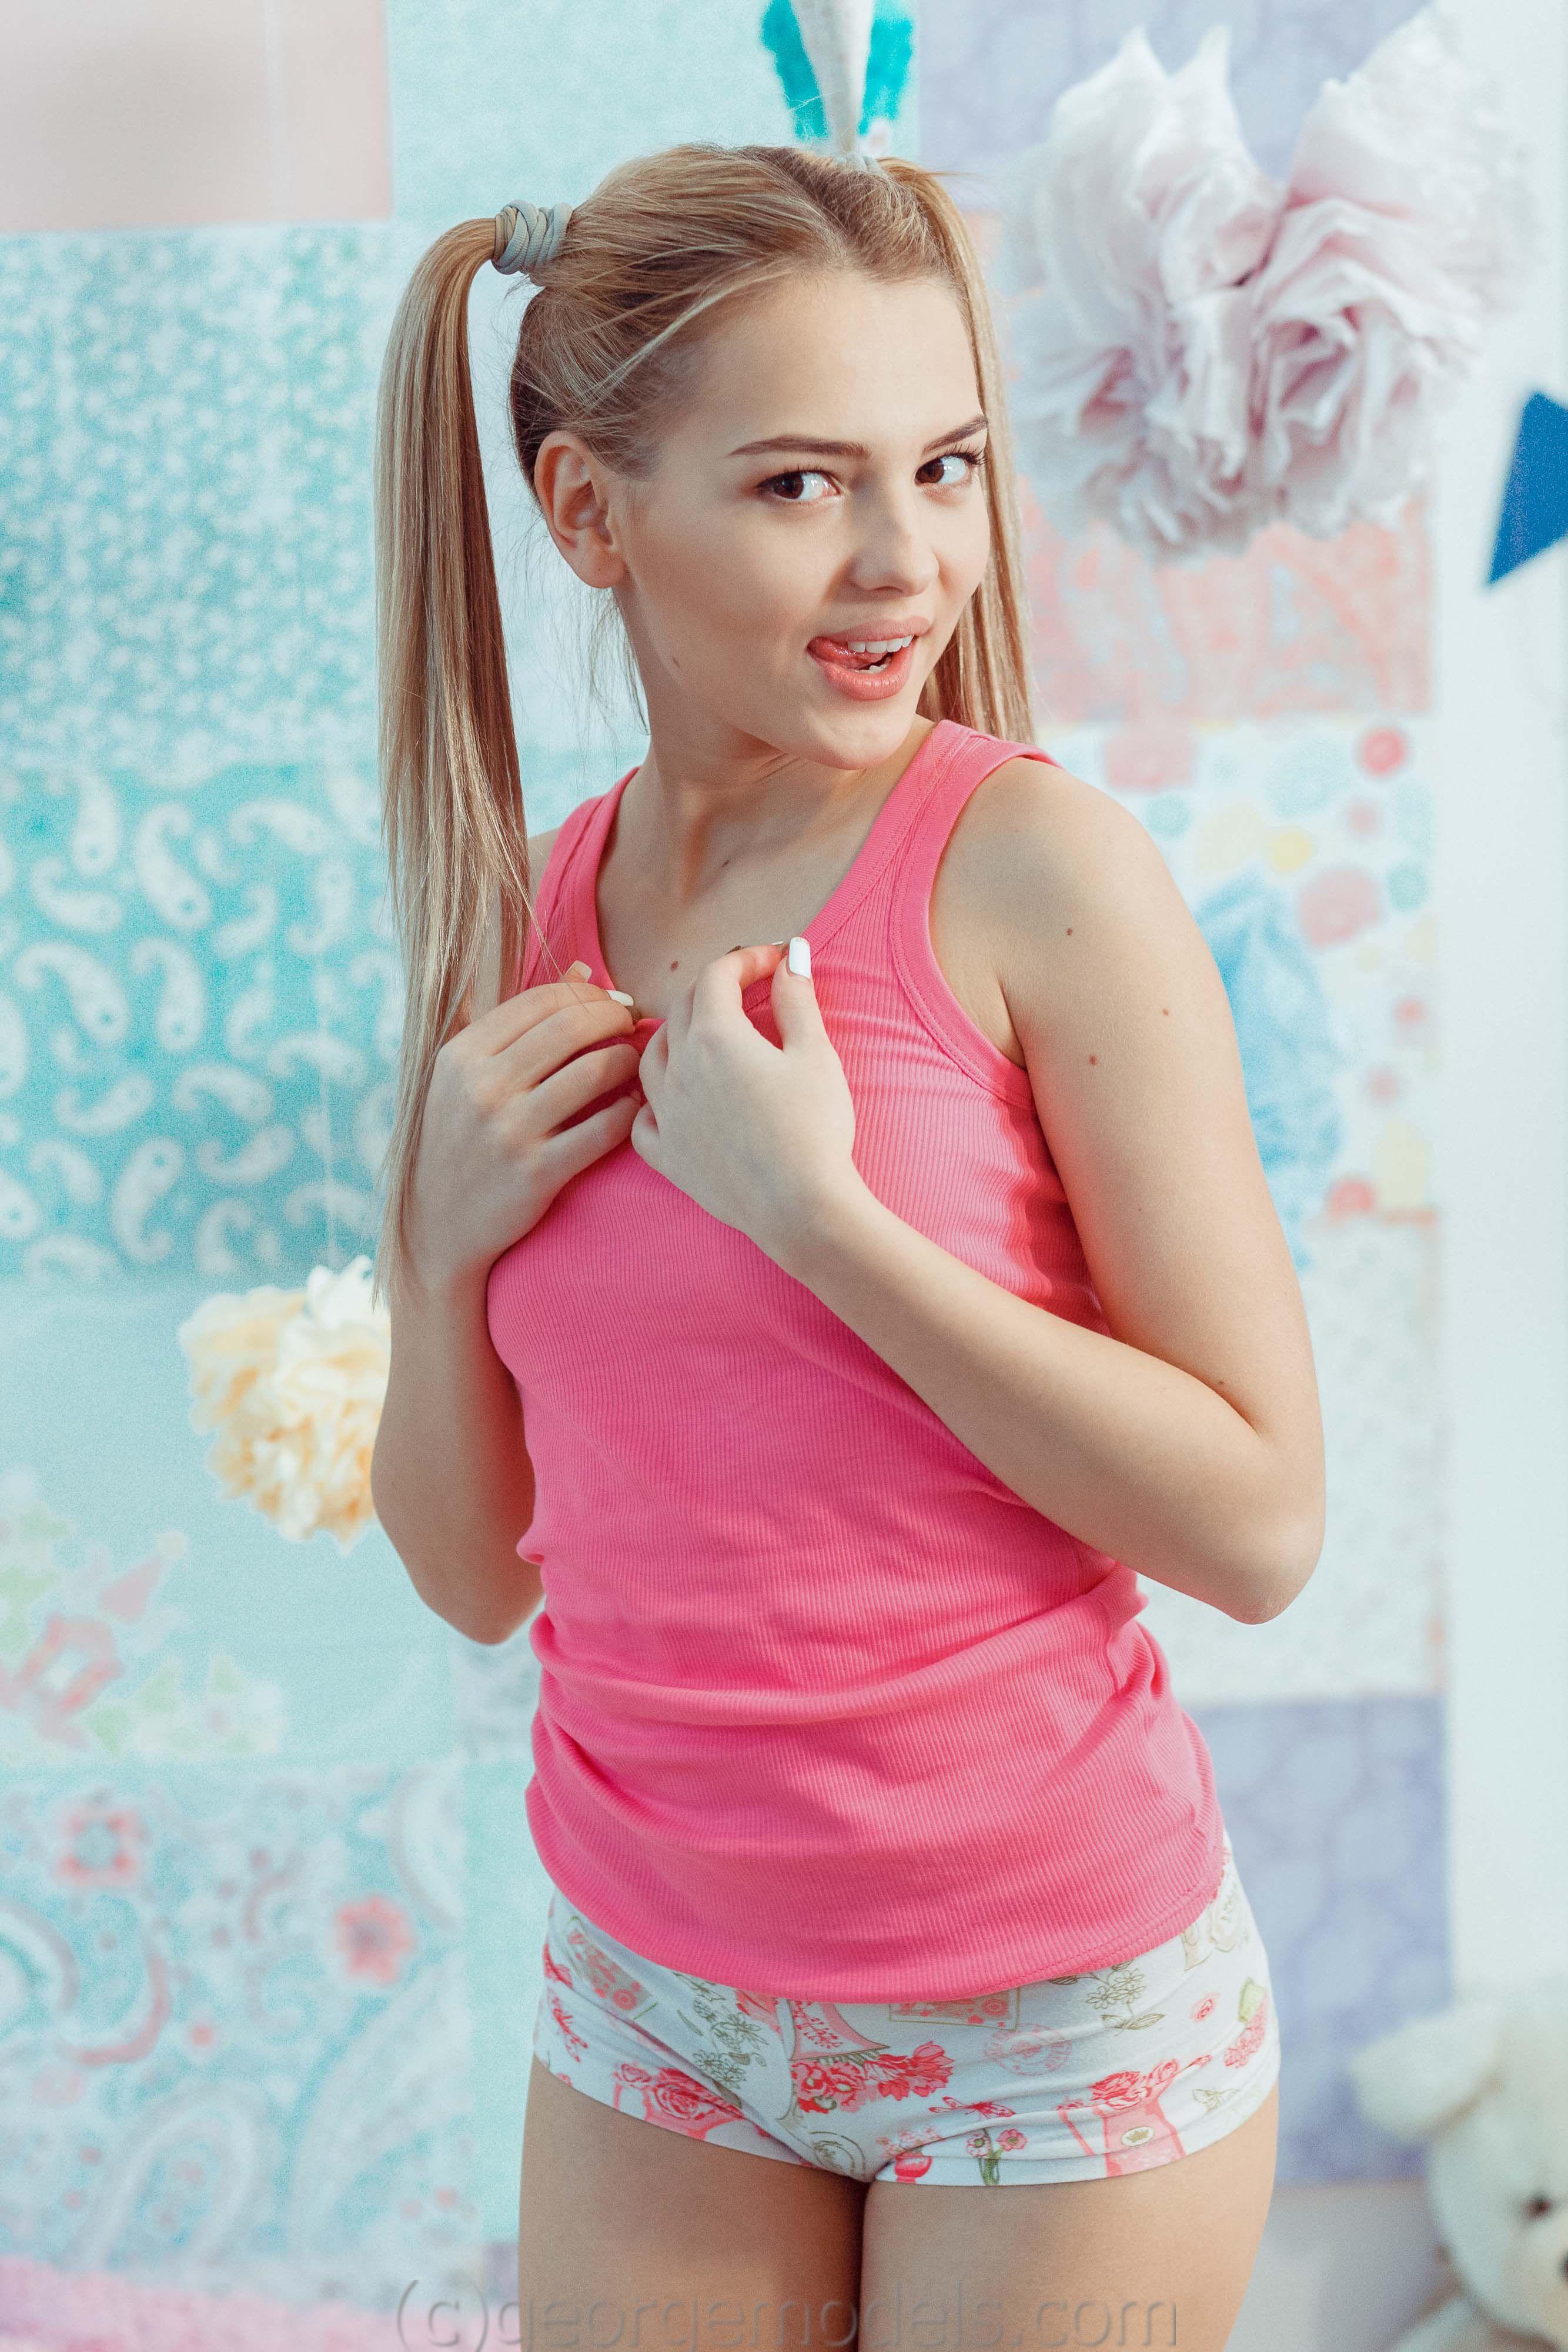 Julia Pink - Model page